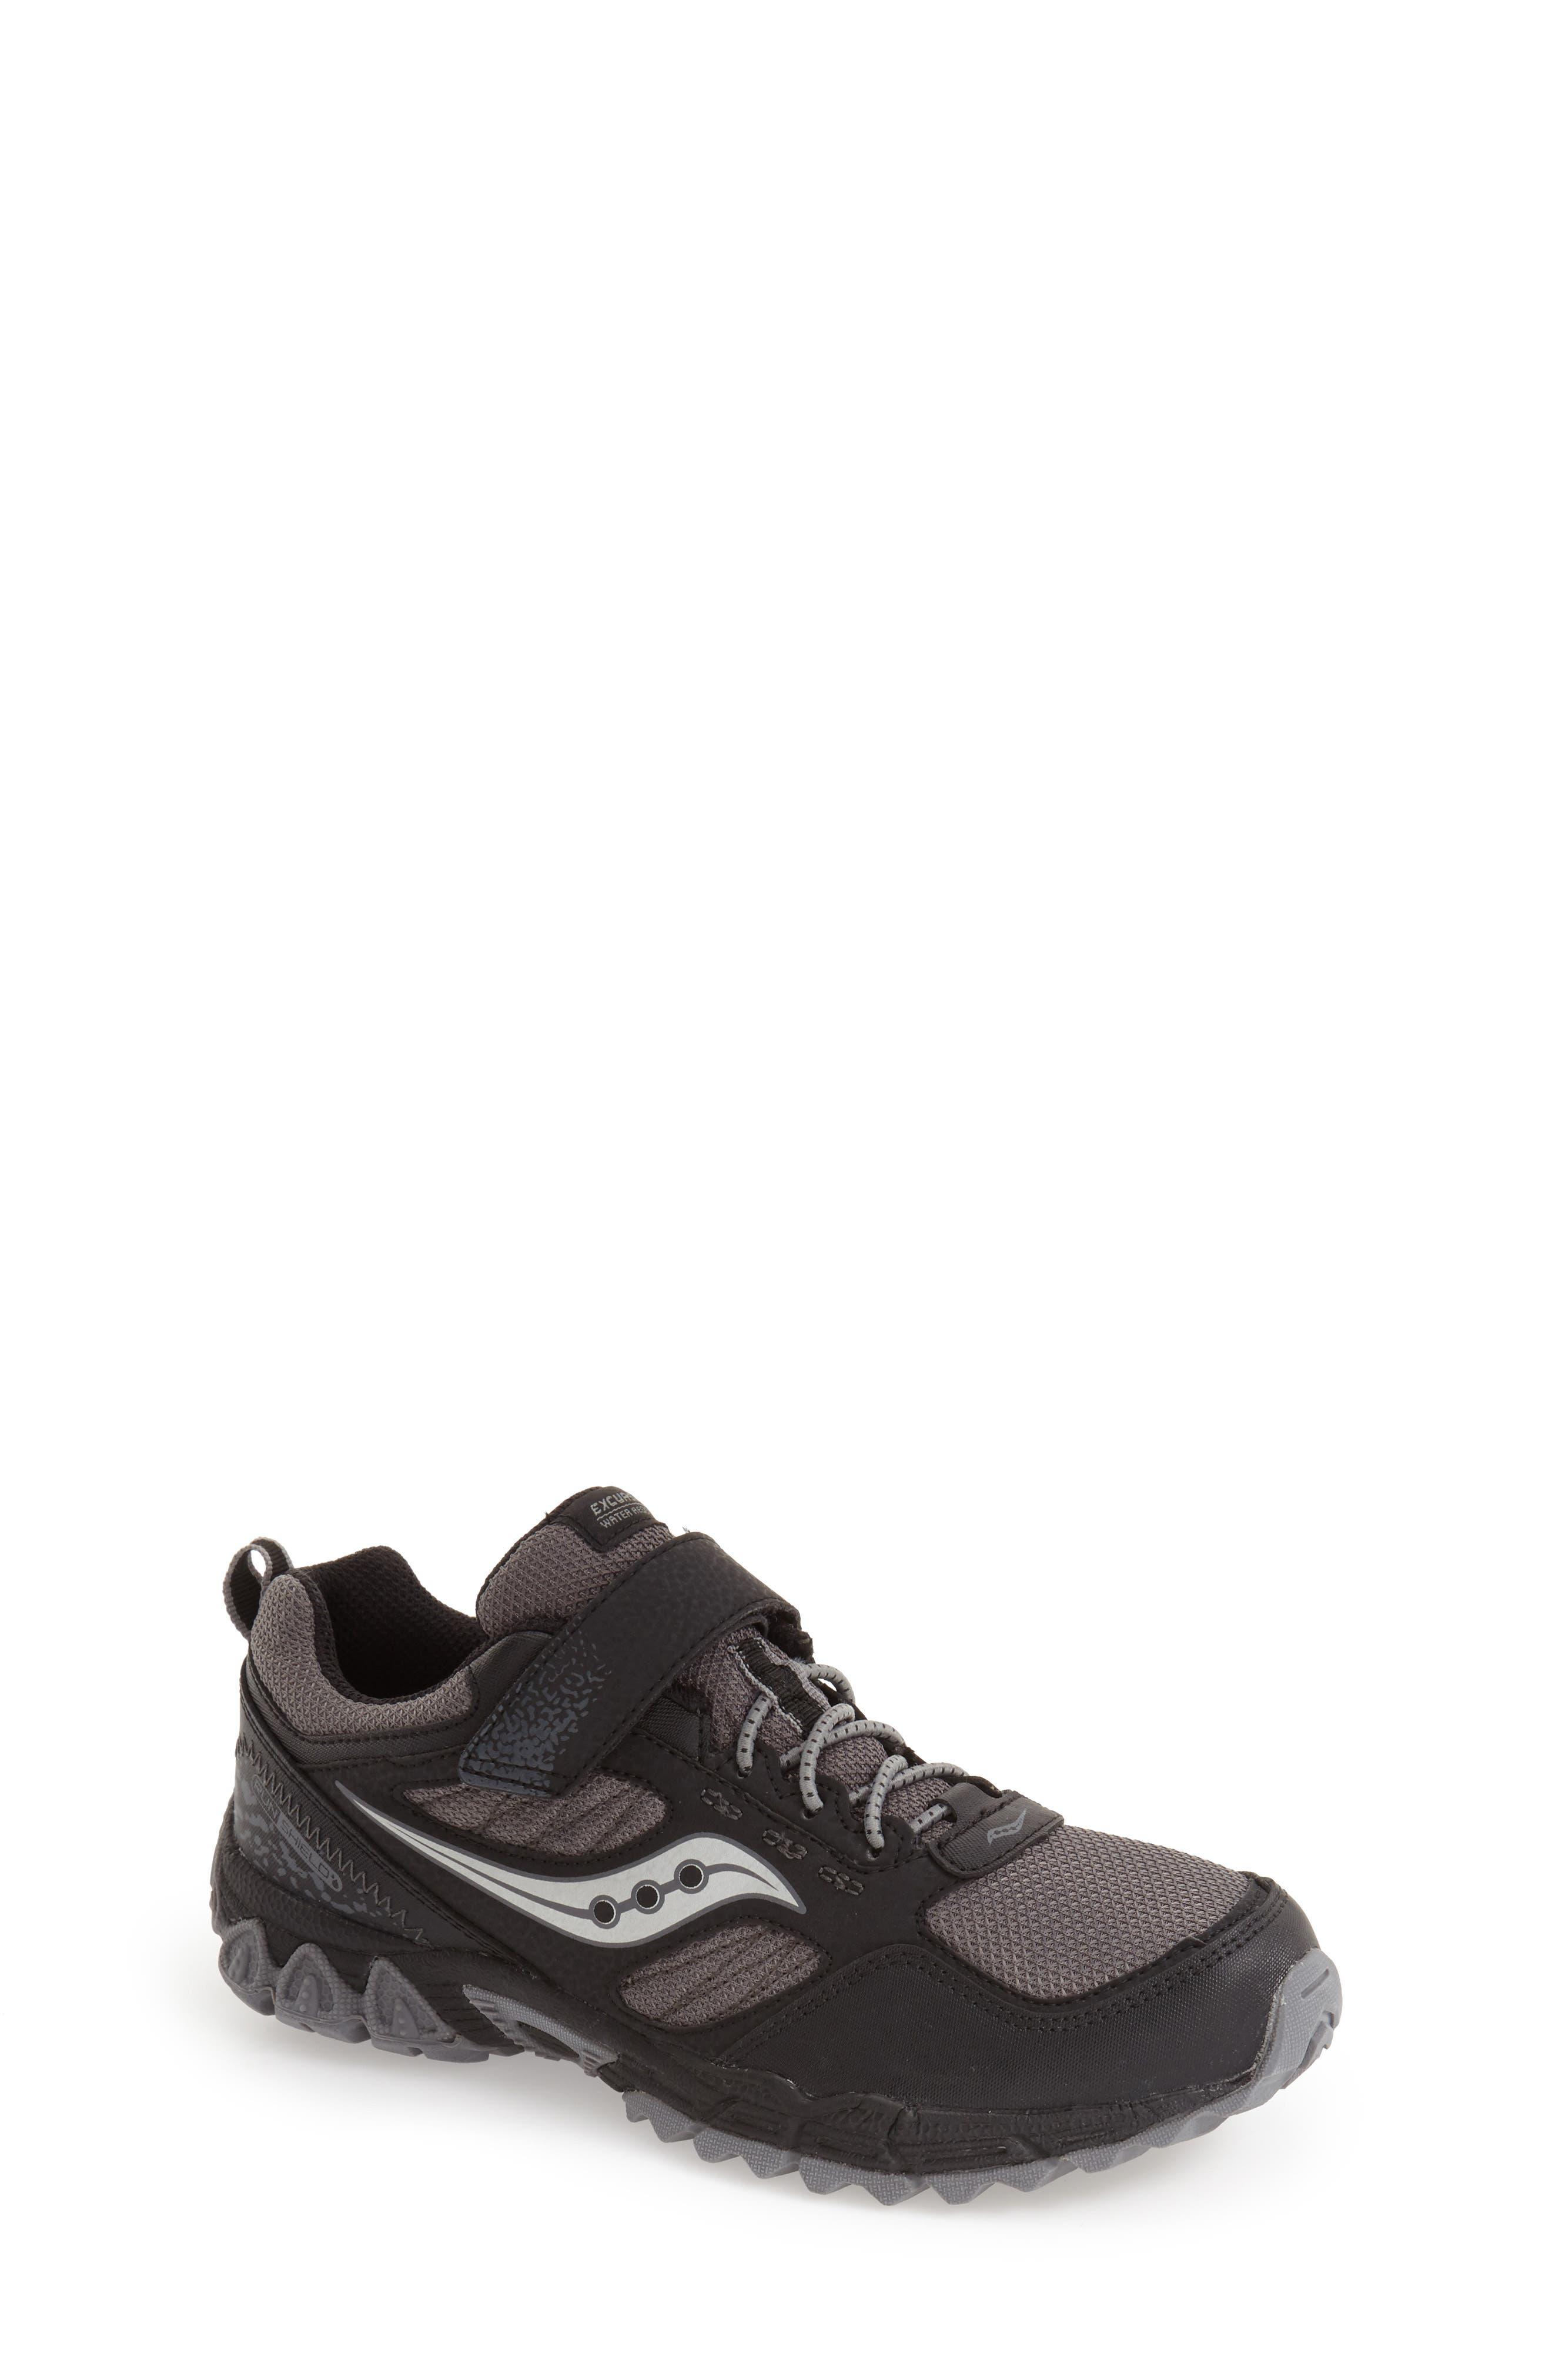 'Excursion Shield' Water Resistant Trail Shoe,                             Alternate thumbnail 2, color,                             001